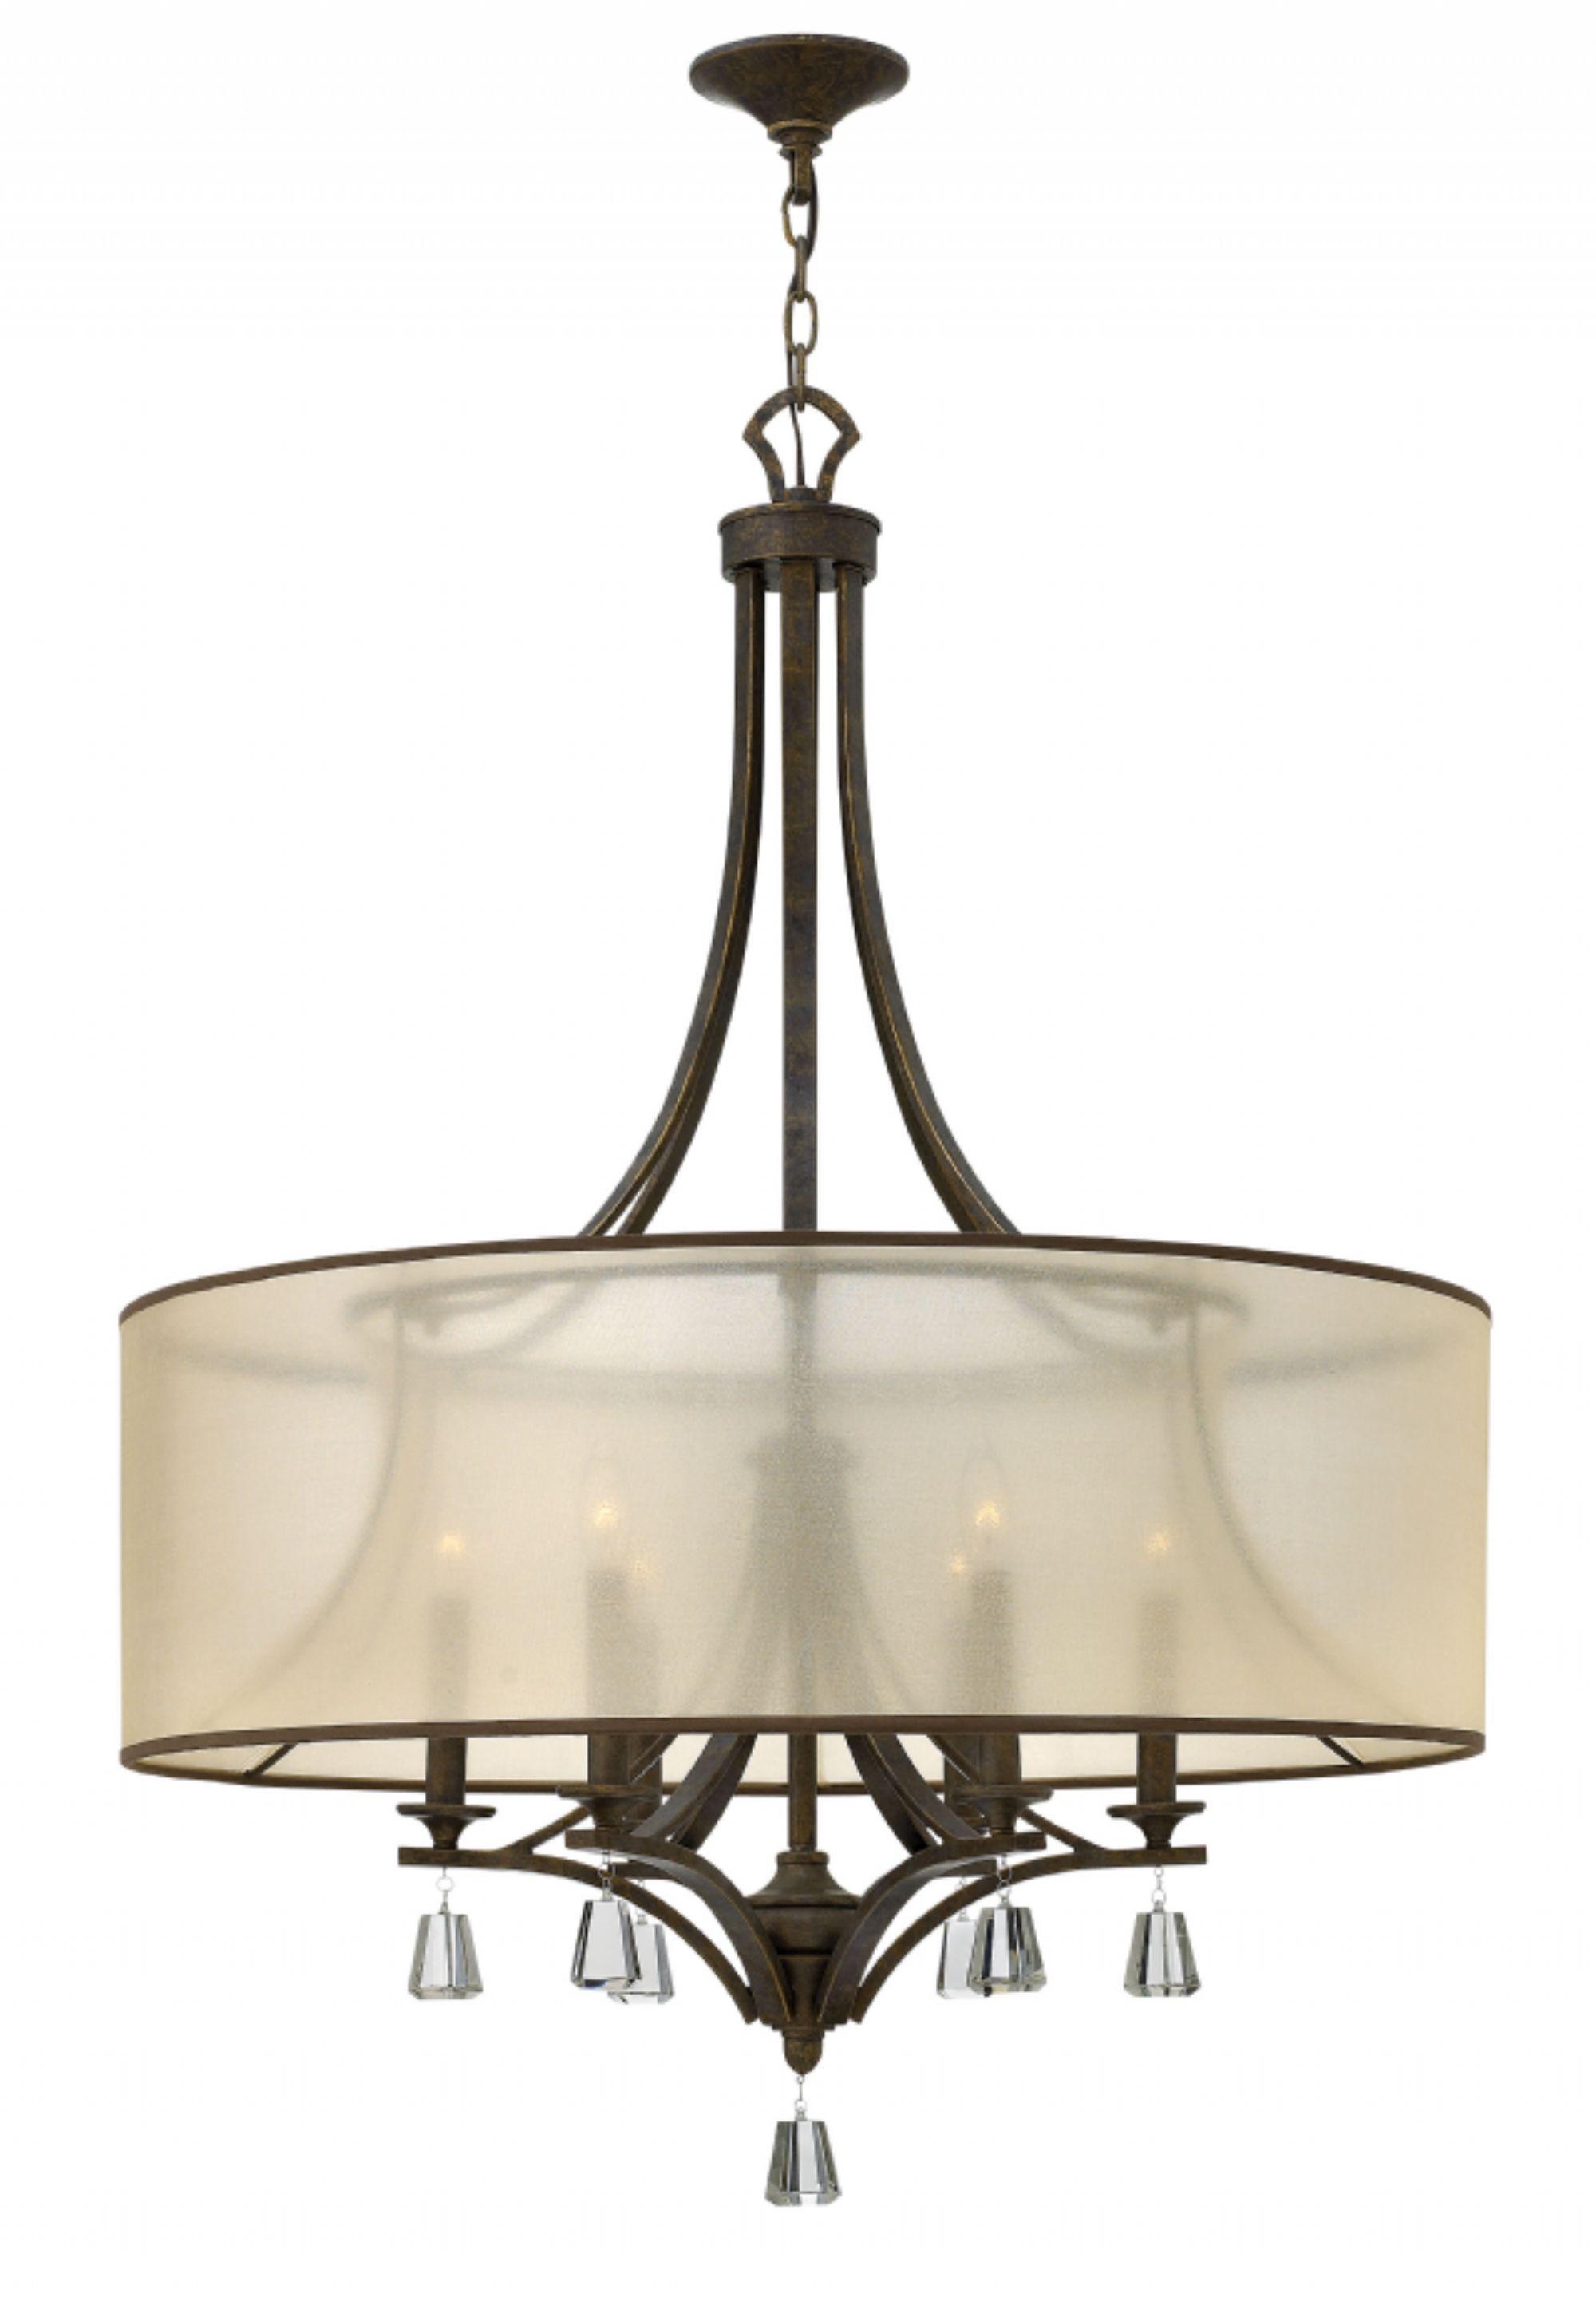 used pendant lighting. Explore Lantern Pendant Lighting And More! Used